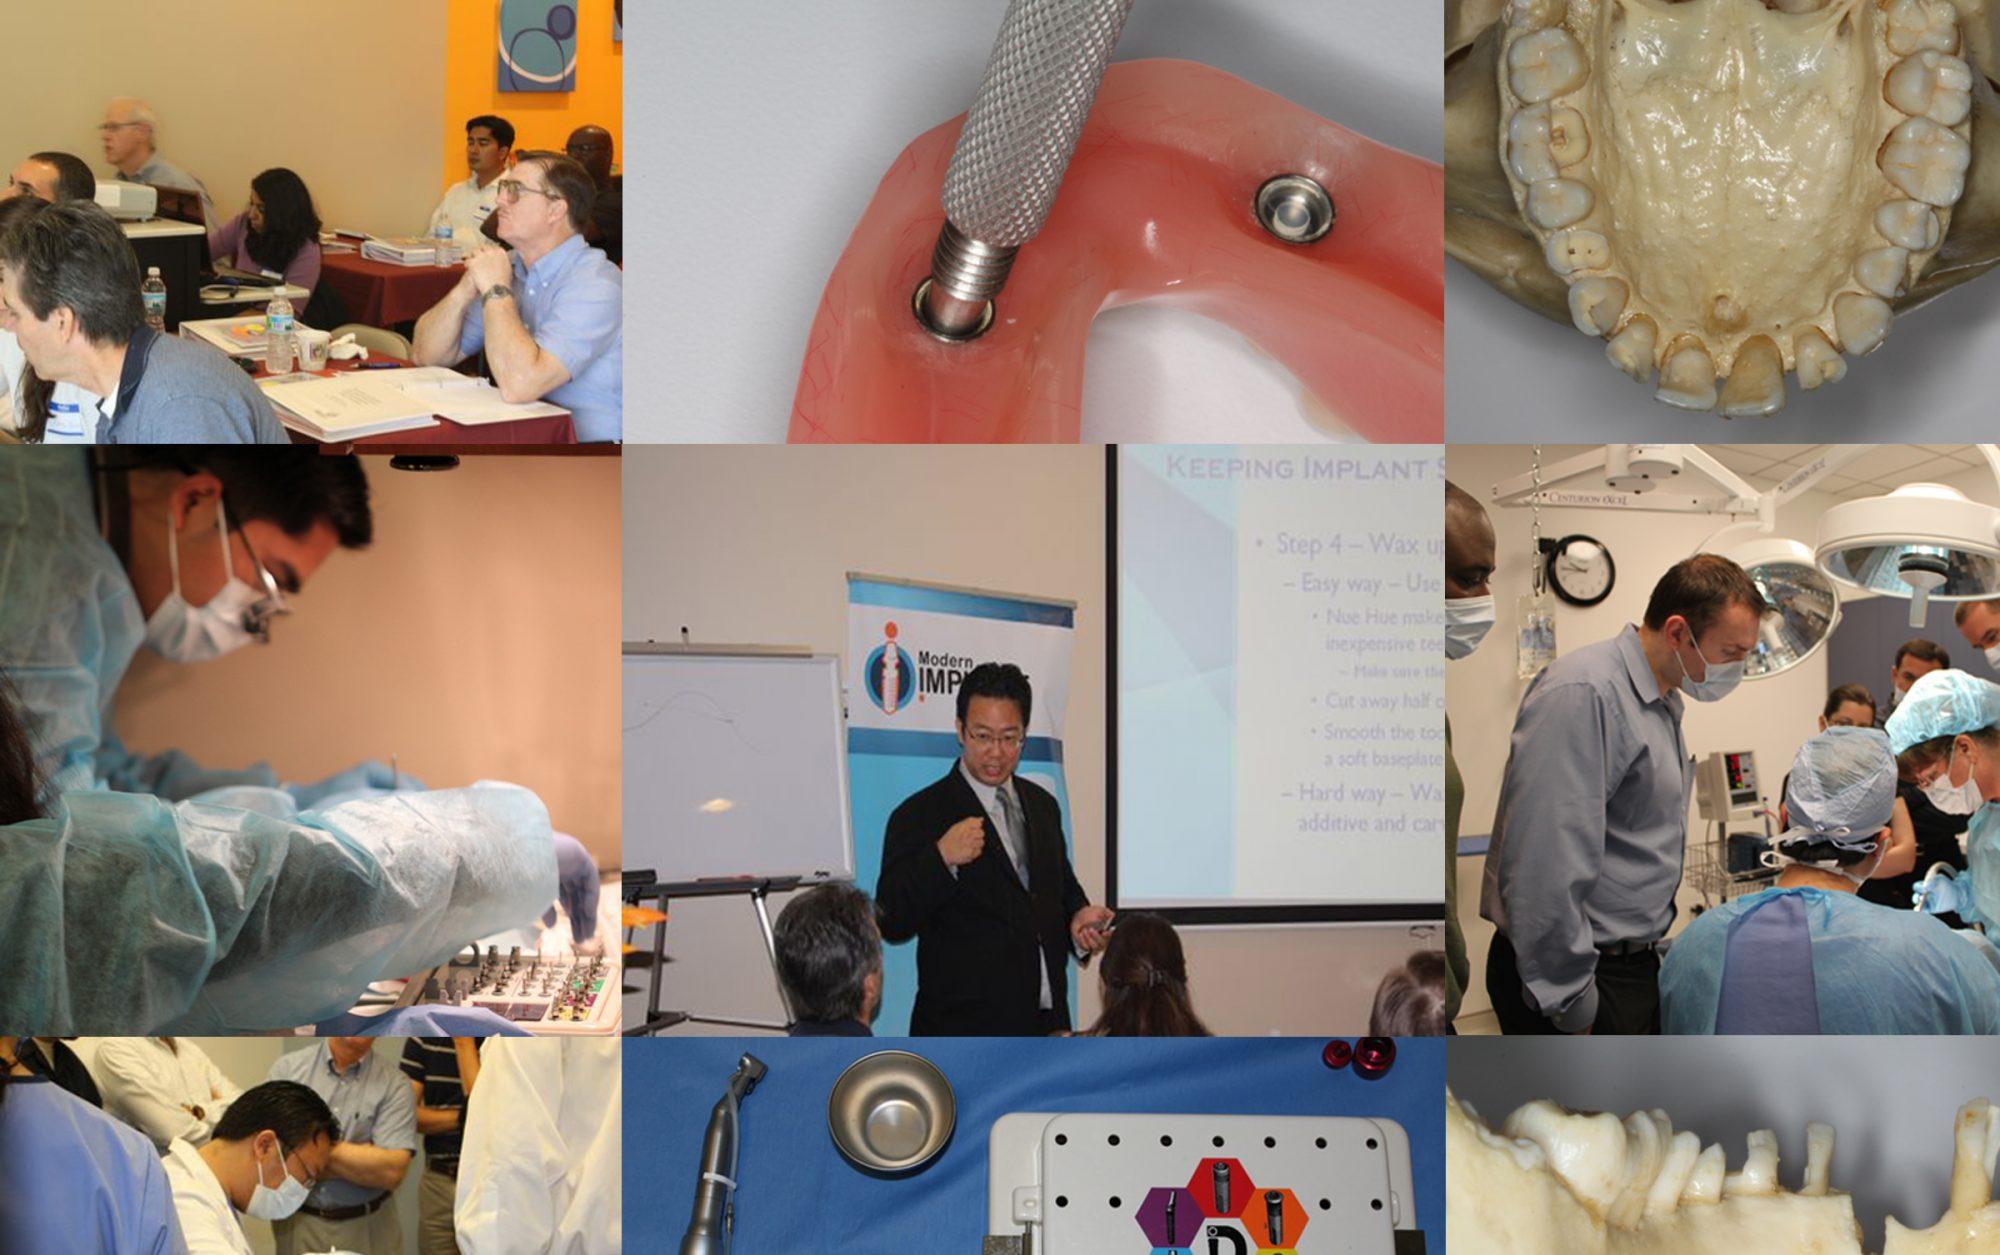 Modern Implant Institute